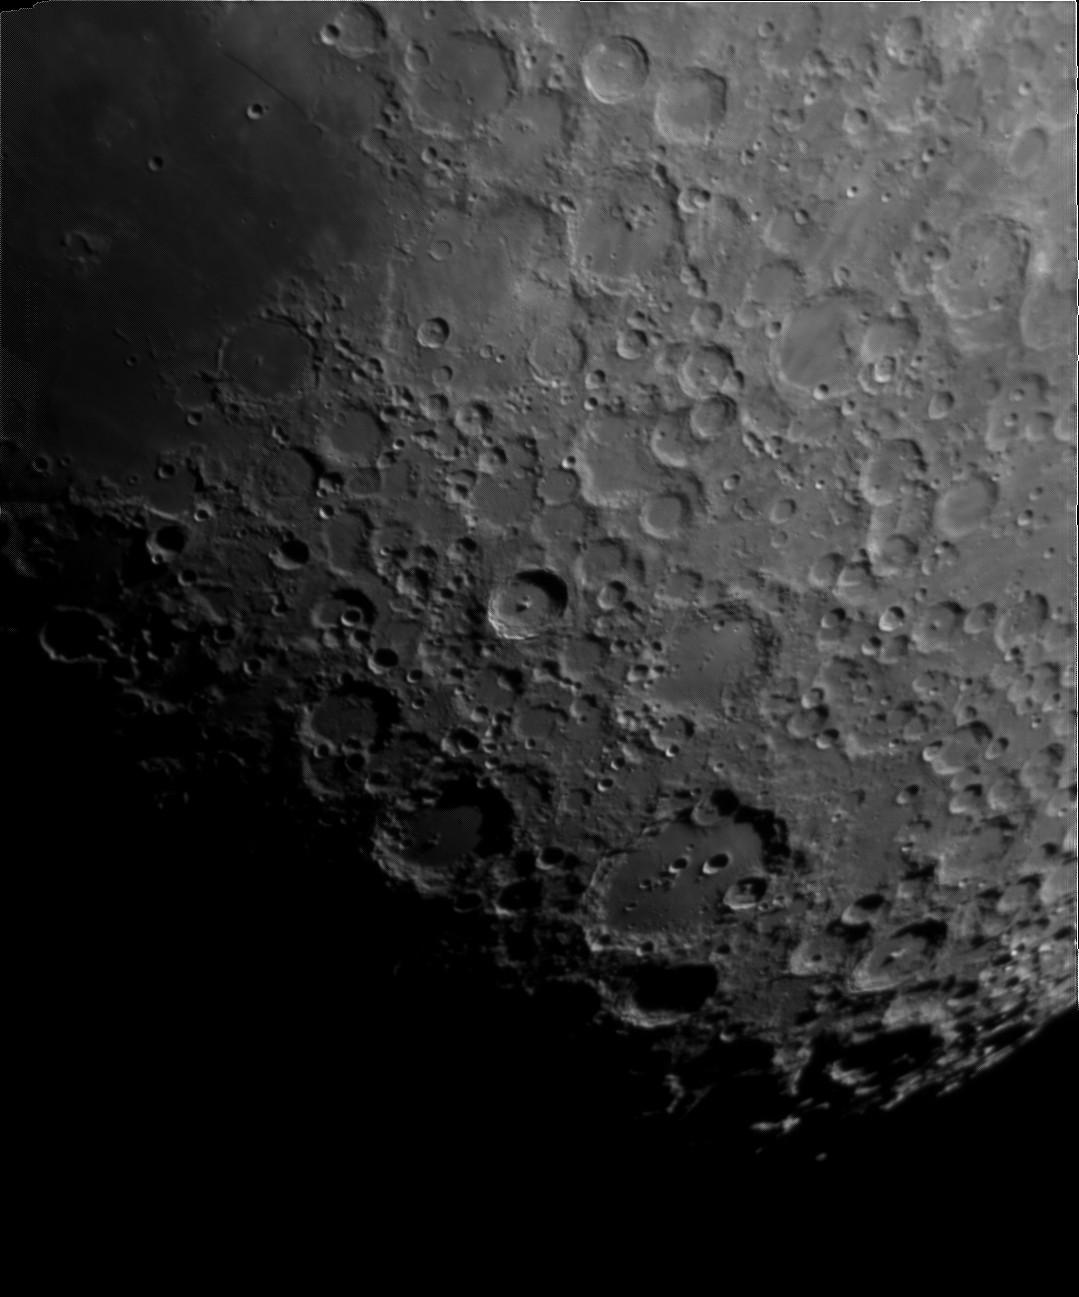 La Lune - Page 5 Lune-210